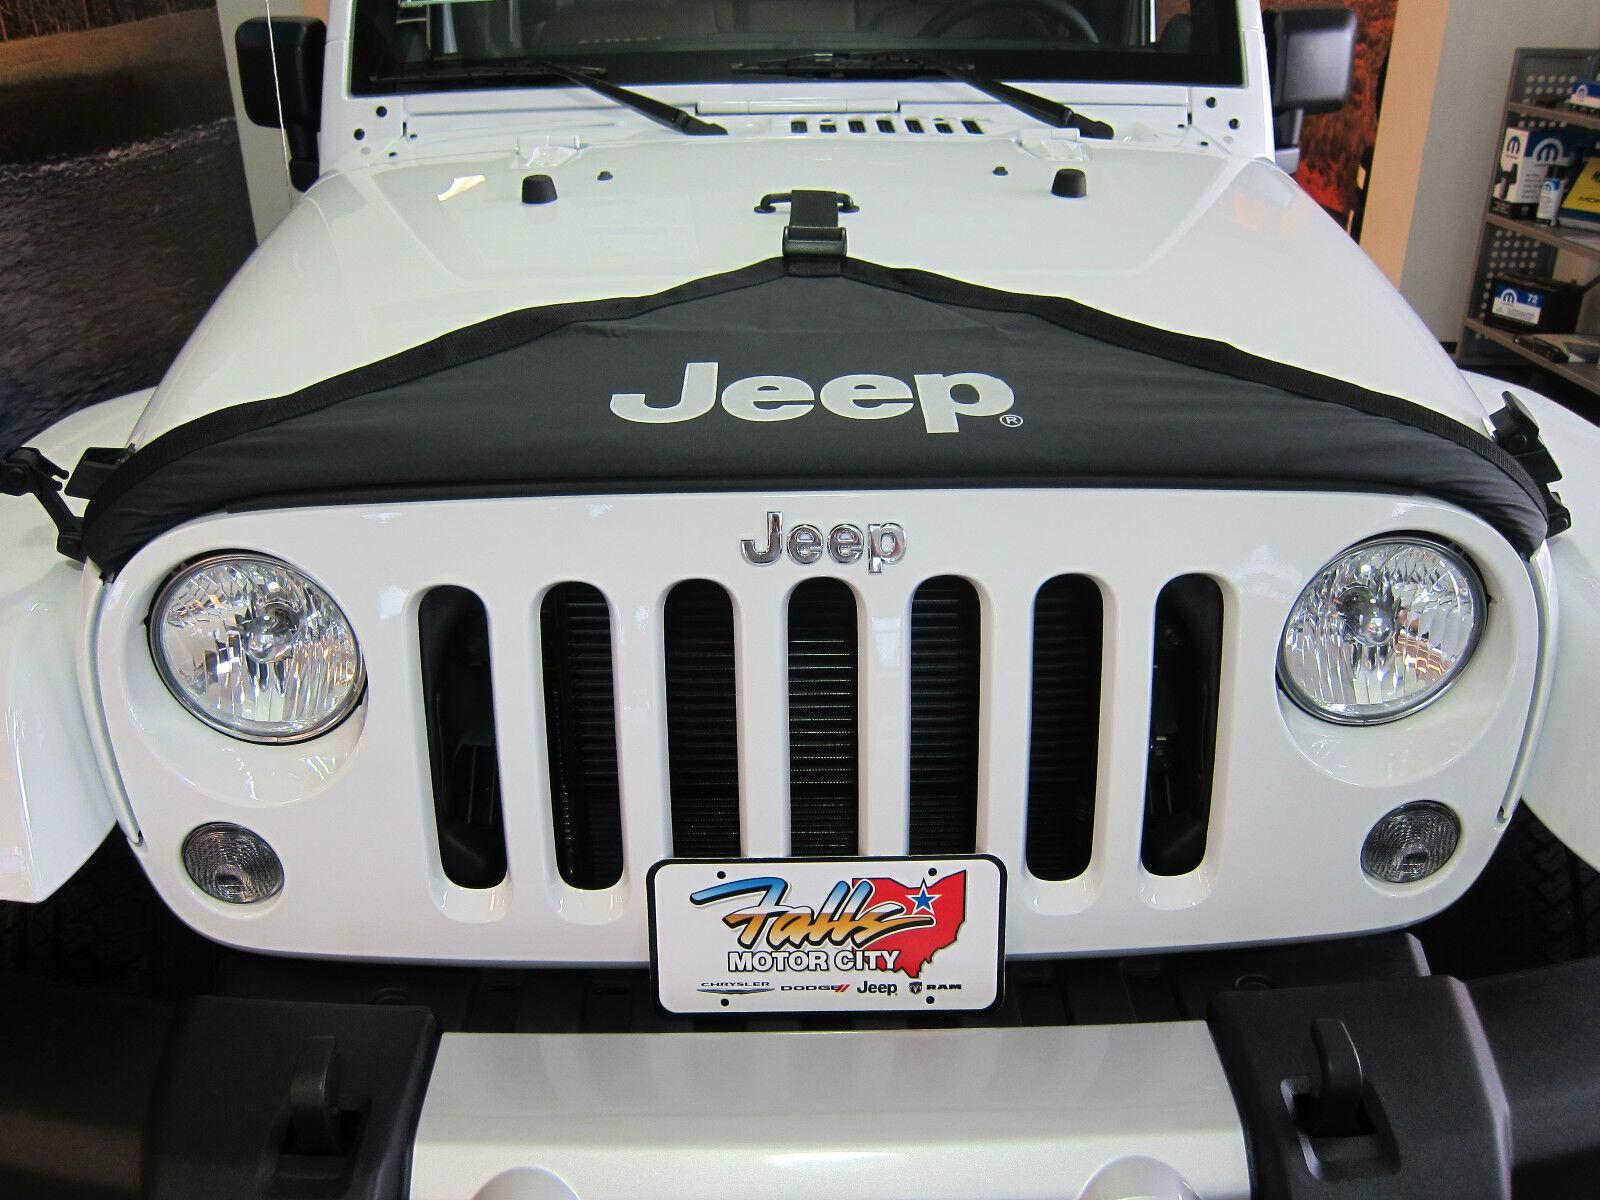 2007-2018 Jeep Wrangler JK Hood Cover Front End Bra Protector Kit ...